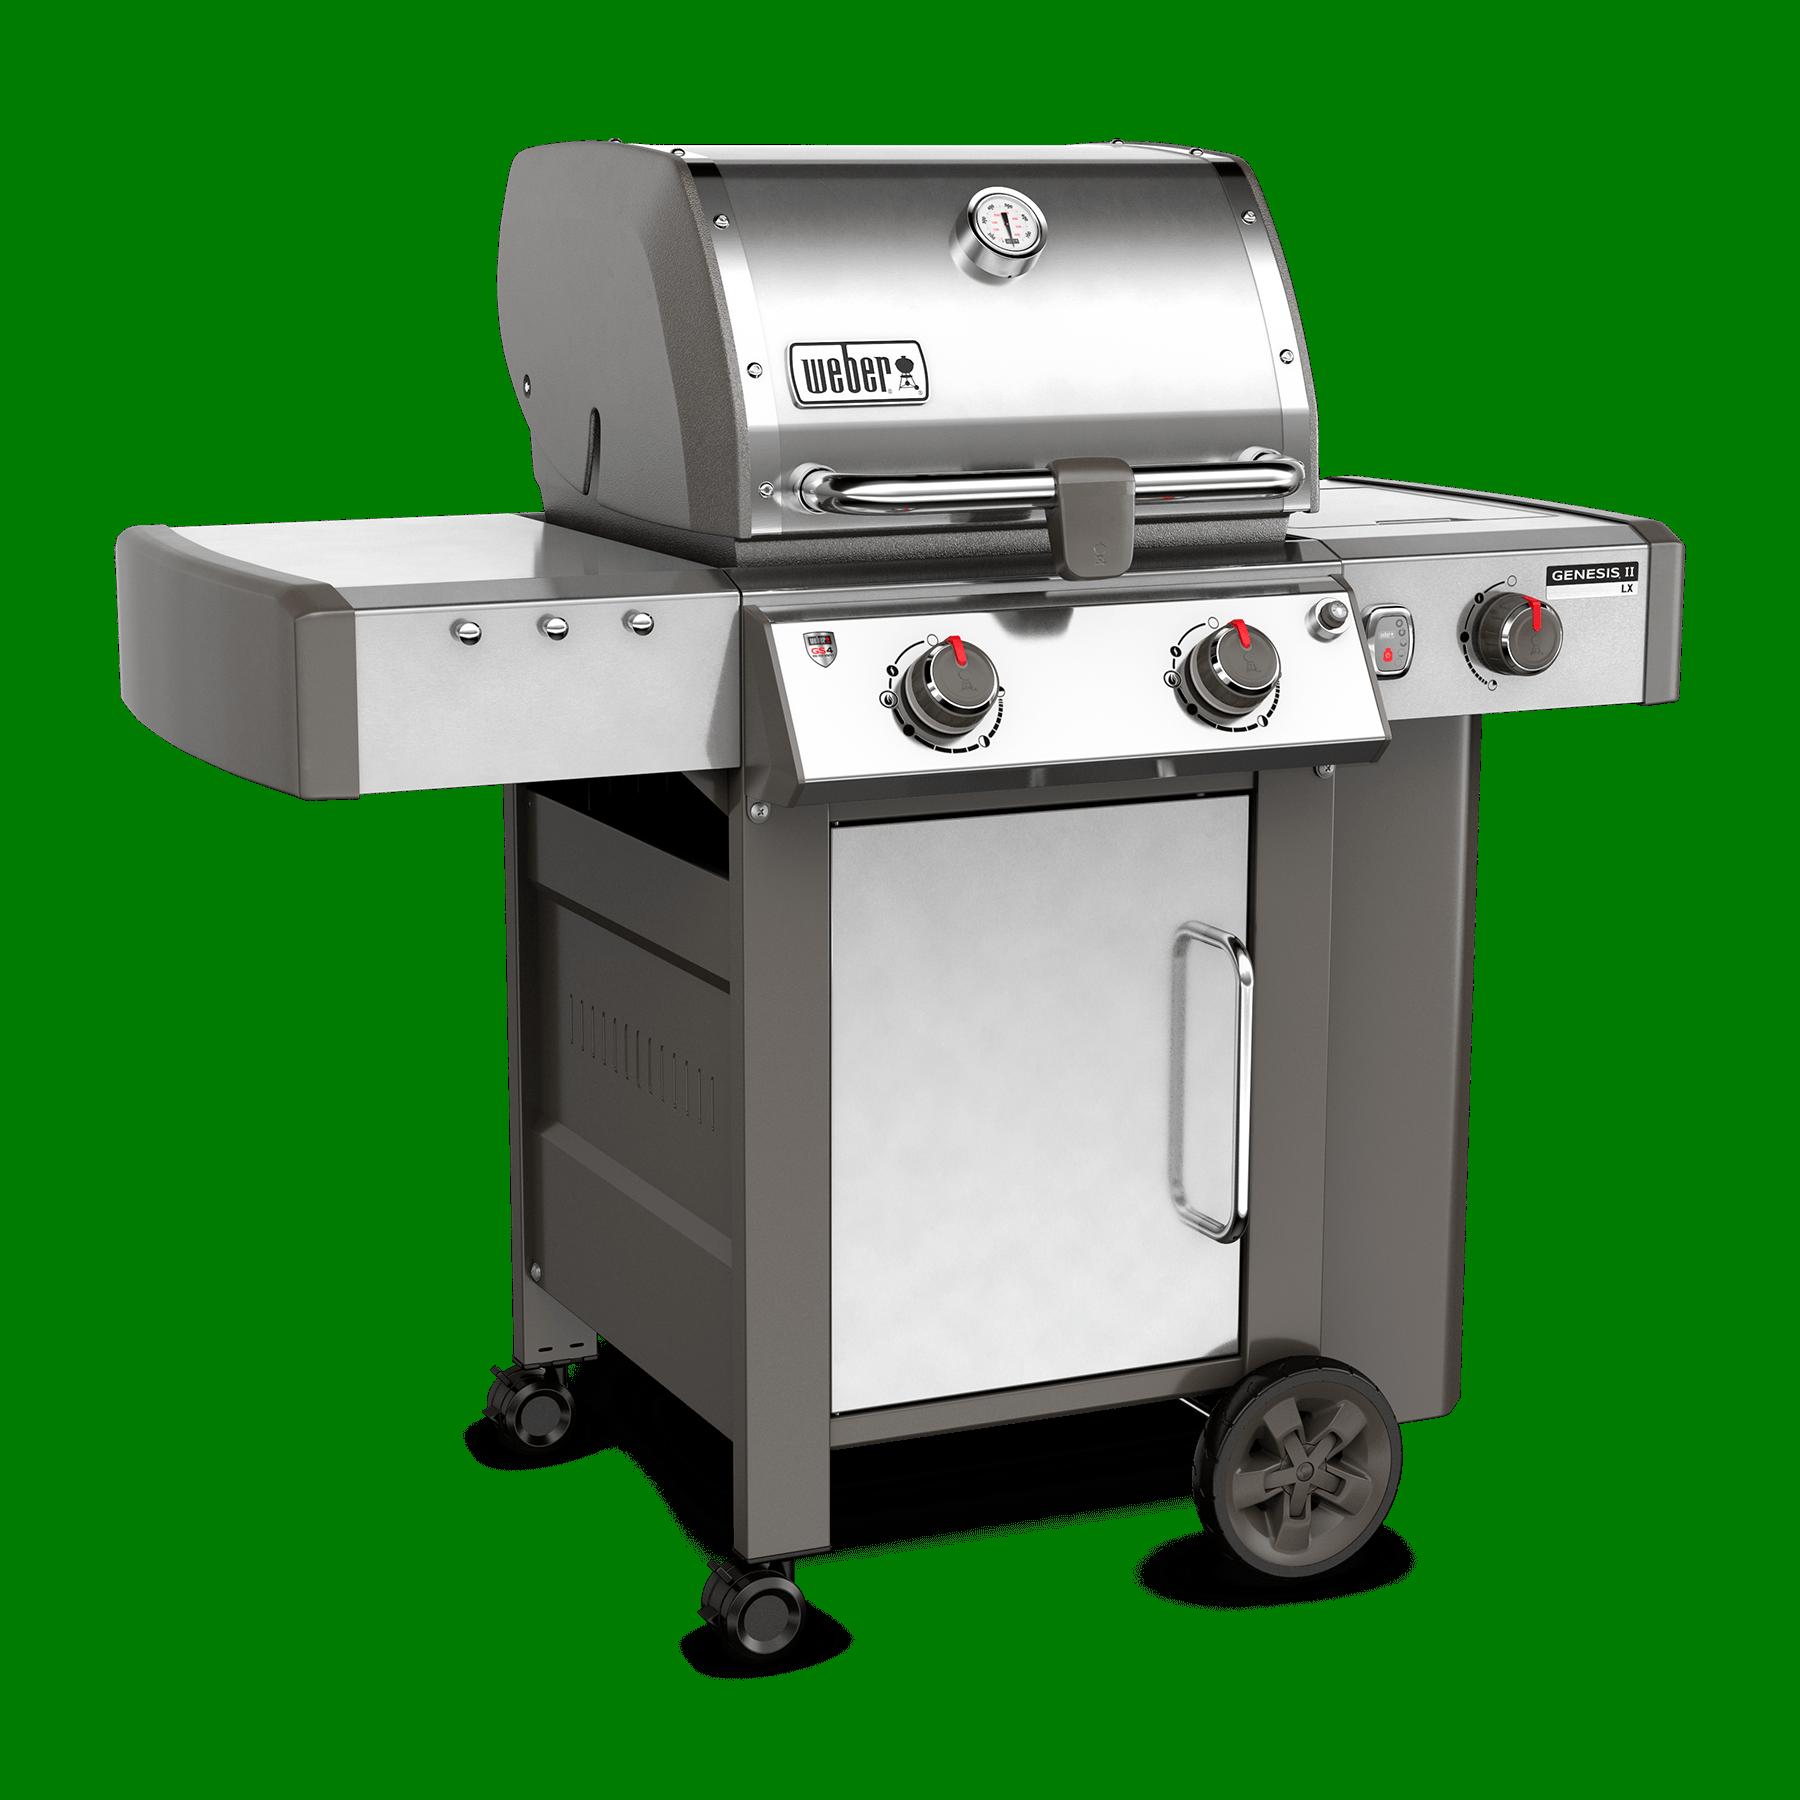 Genesis® II LX S-240 Gas Grill